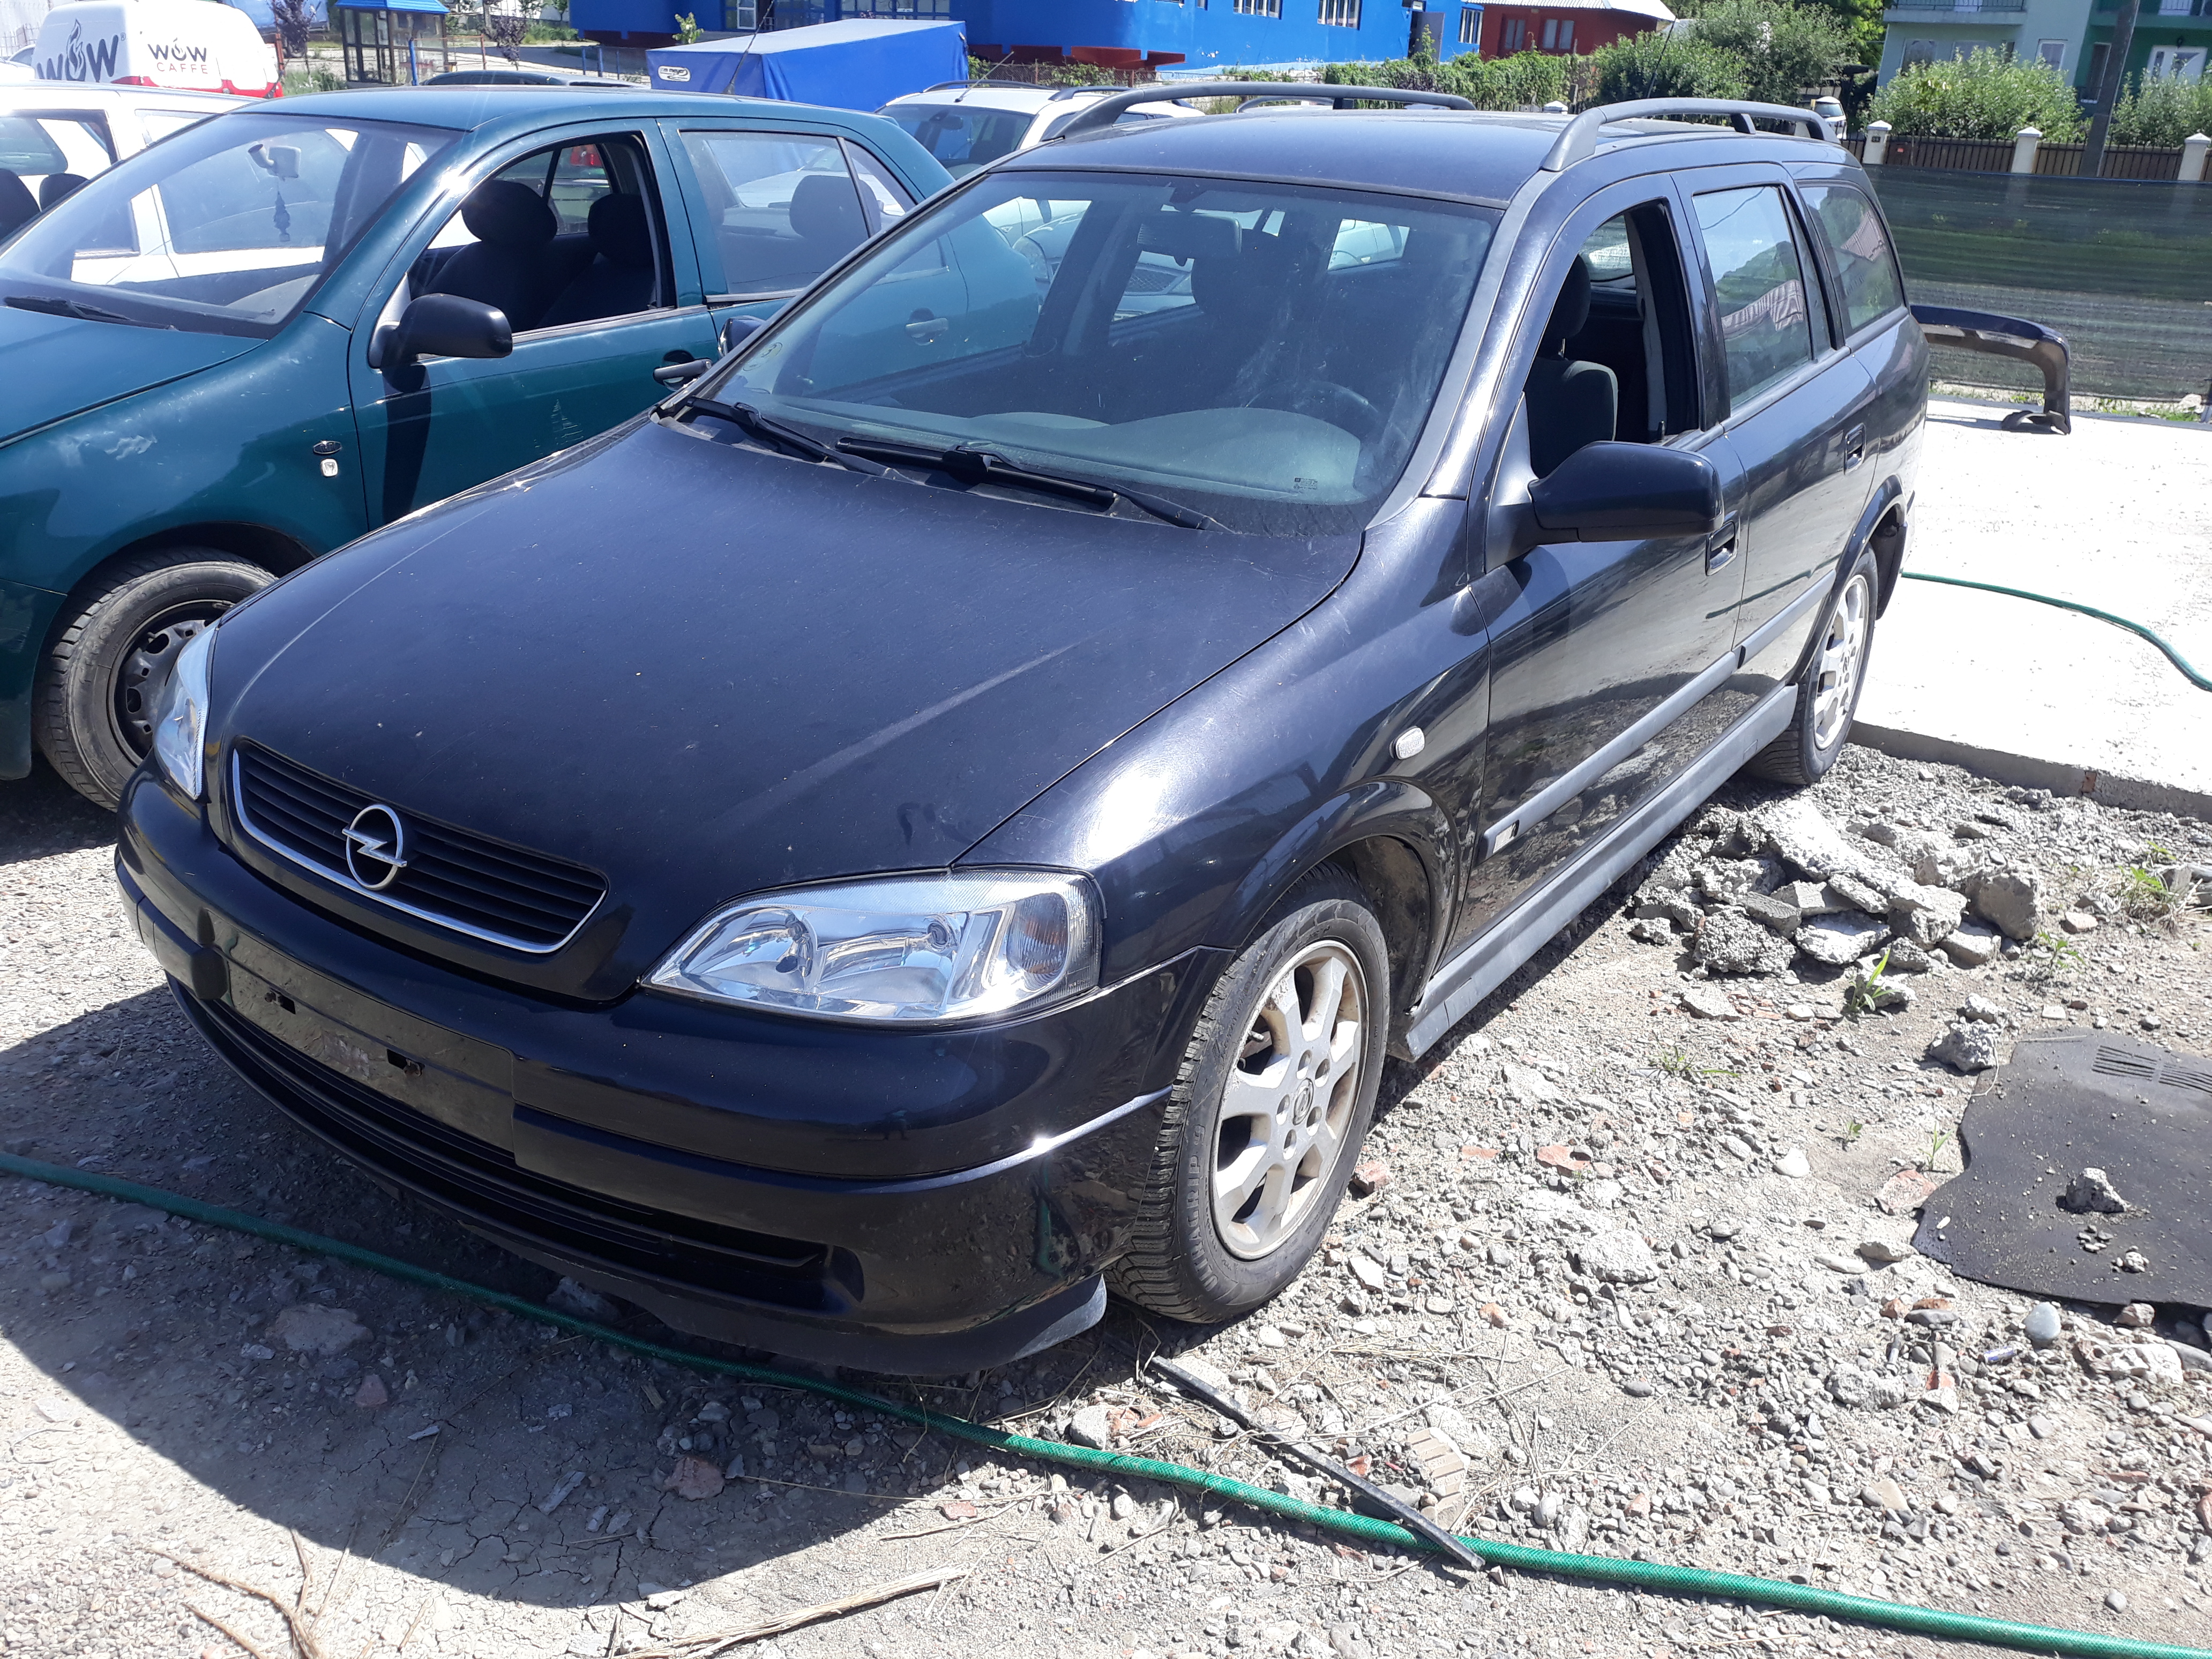 Opel-astra-g